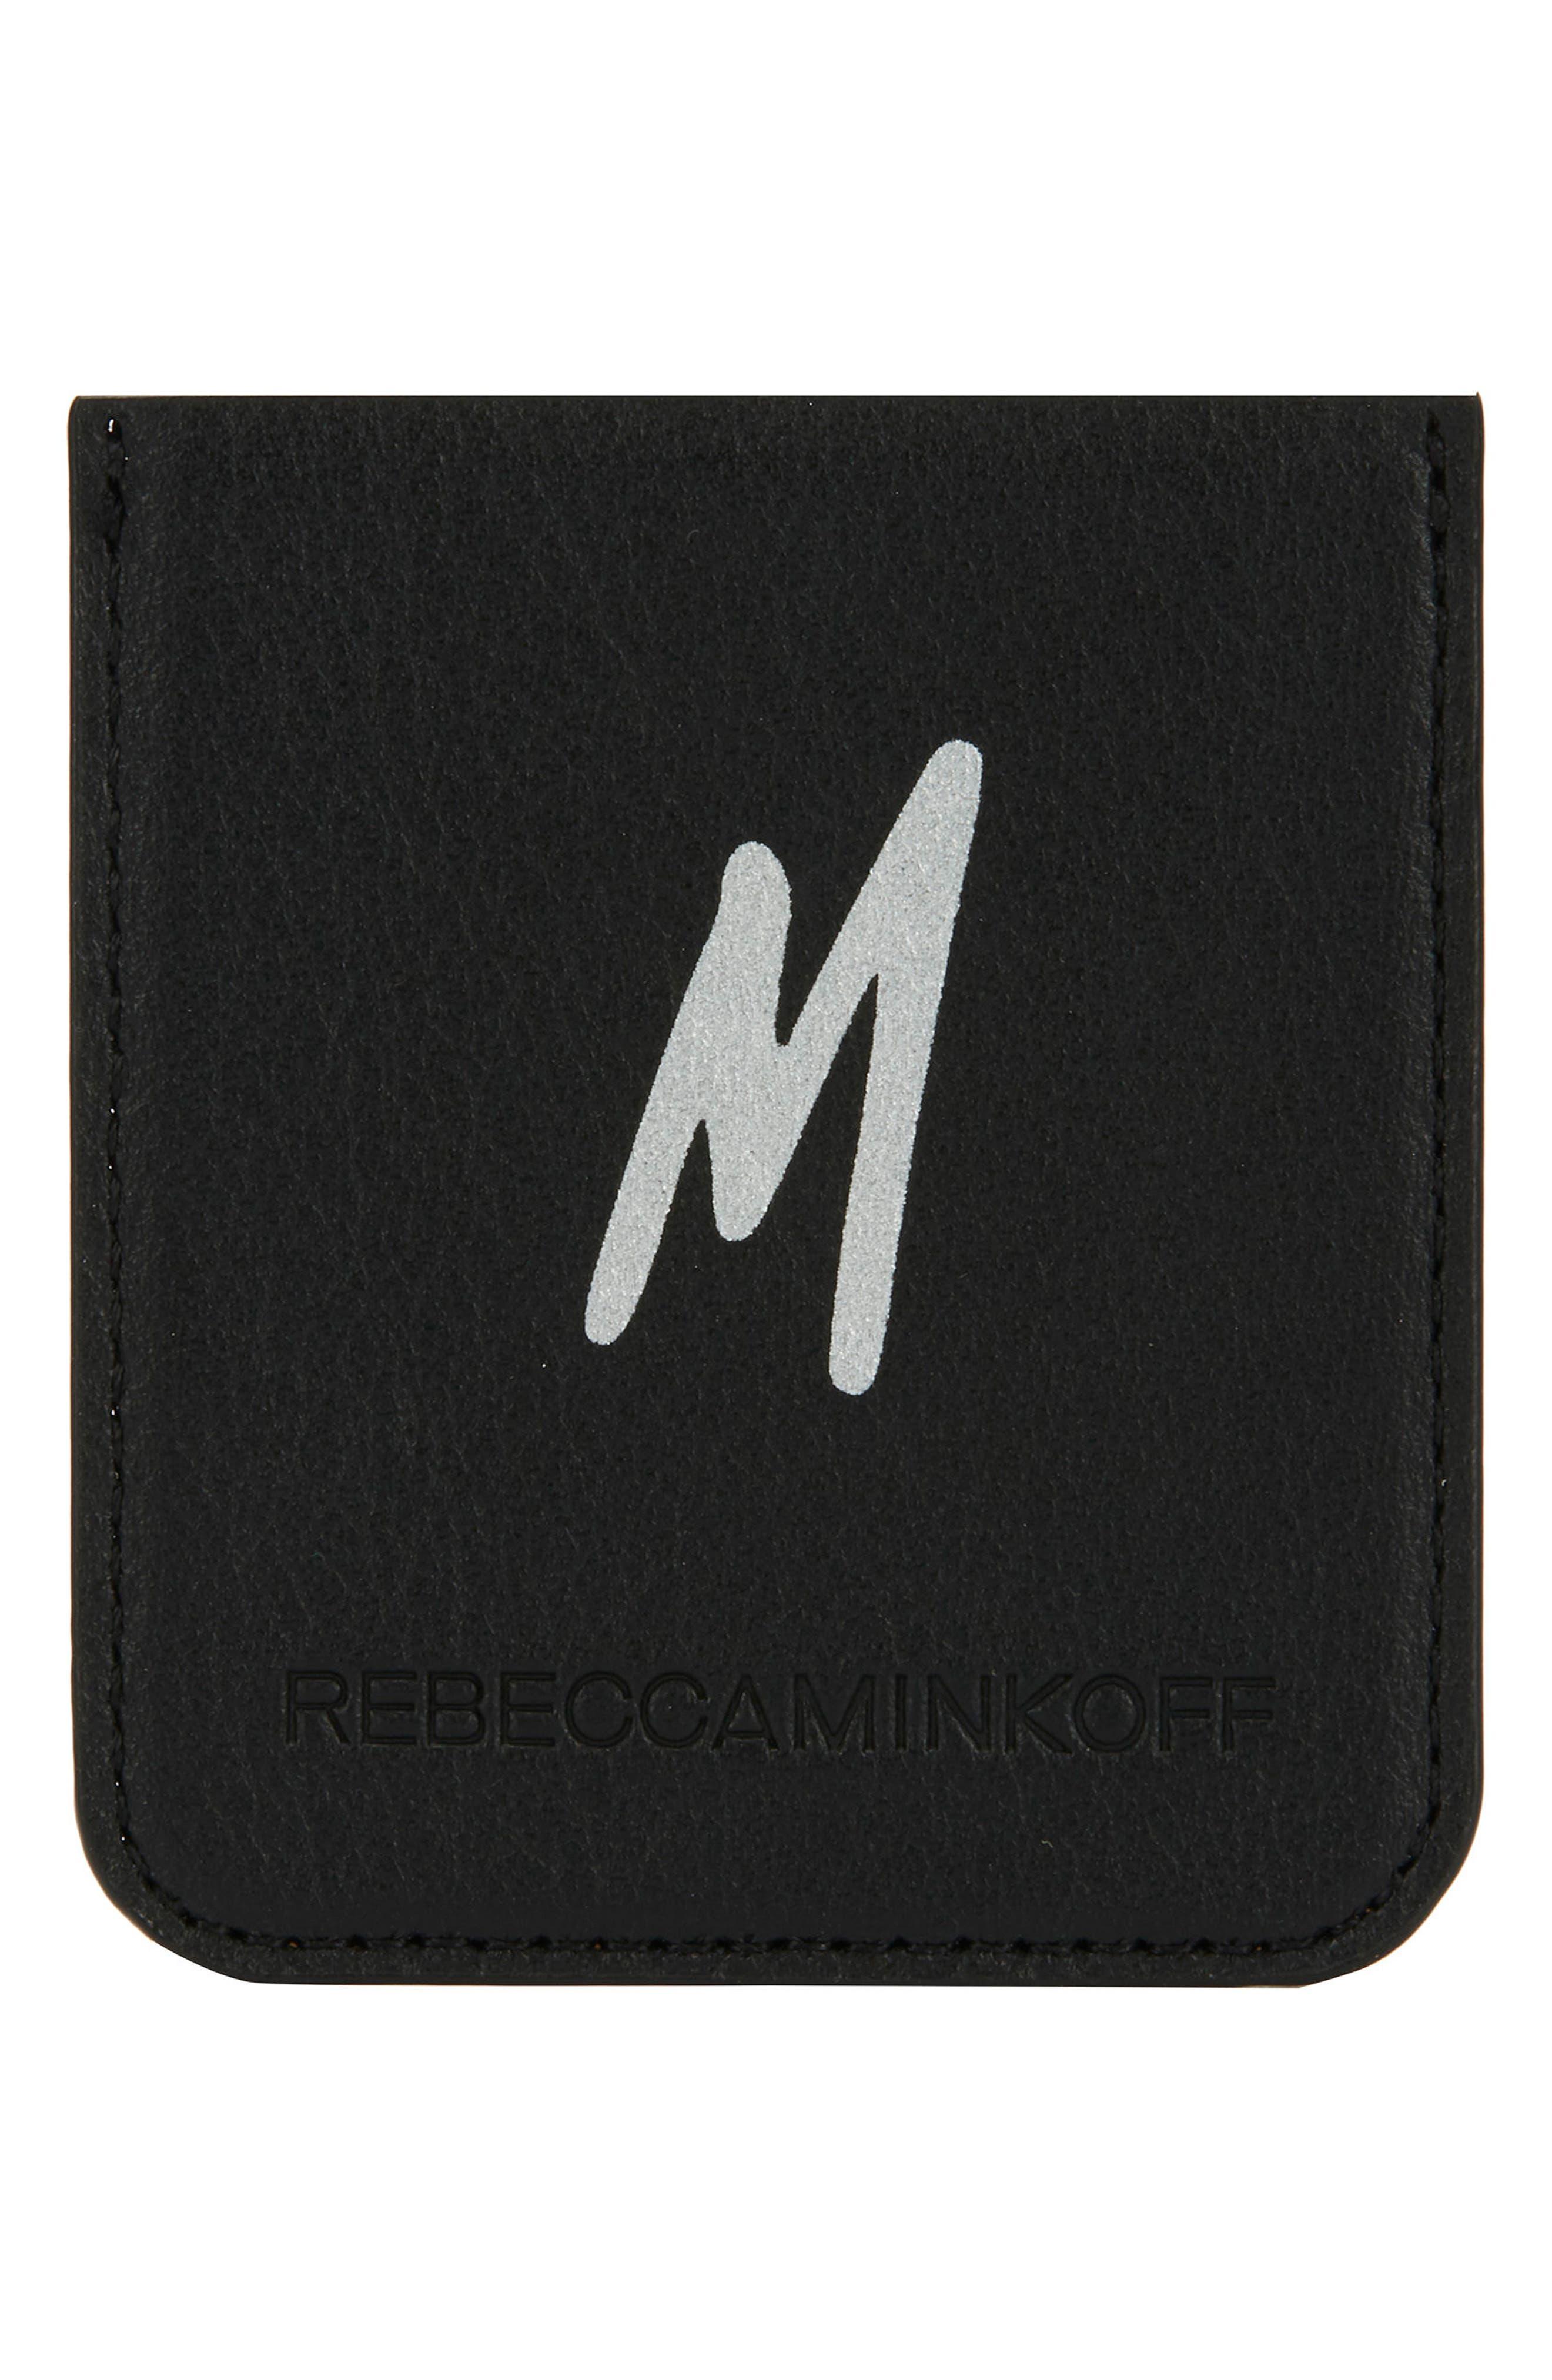 Initial Smartphone Sticker Pocket,                             Main thumbnail 1, color,                             M - BLACK/ SILVER FOIL